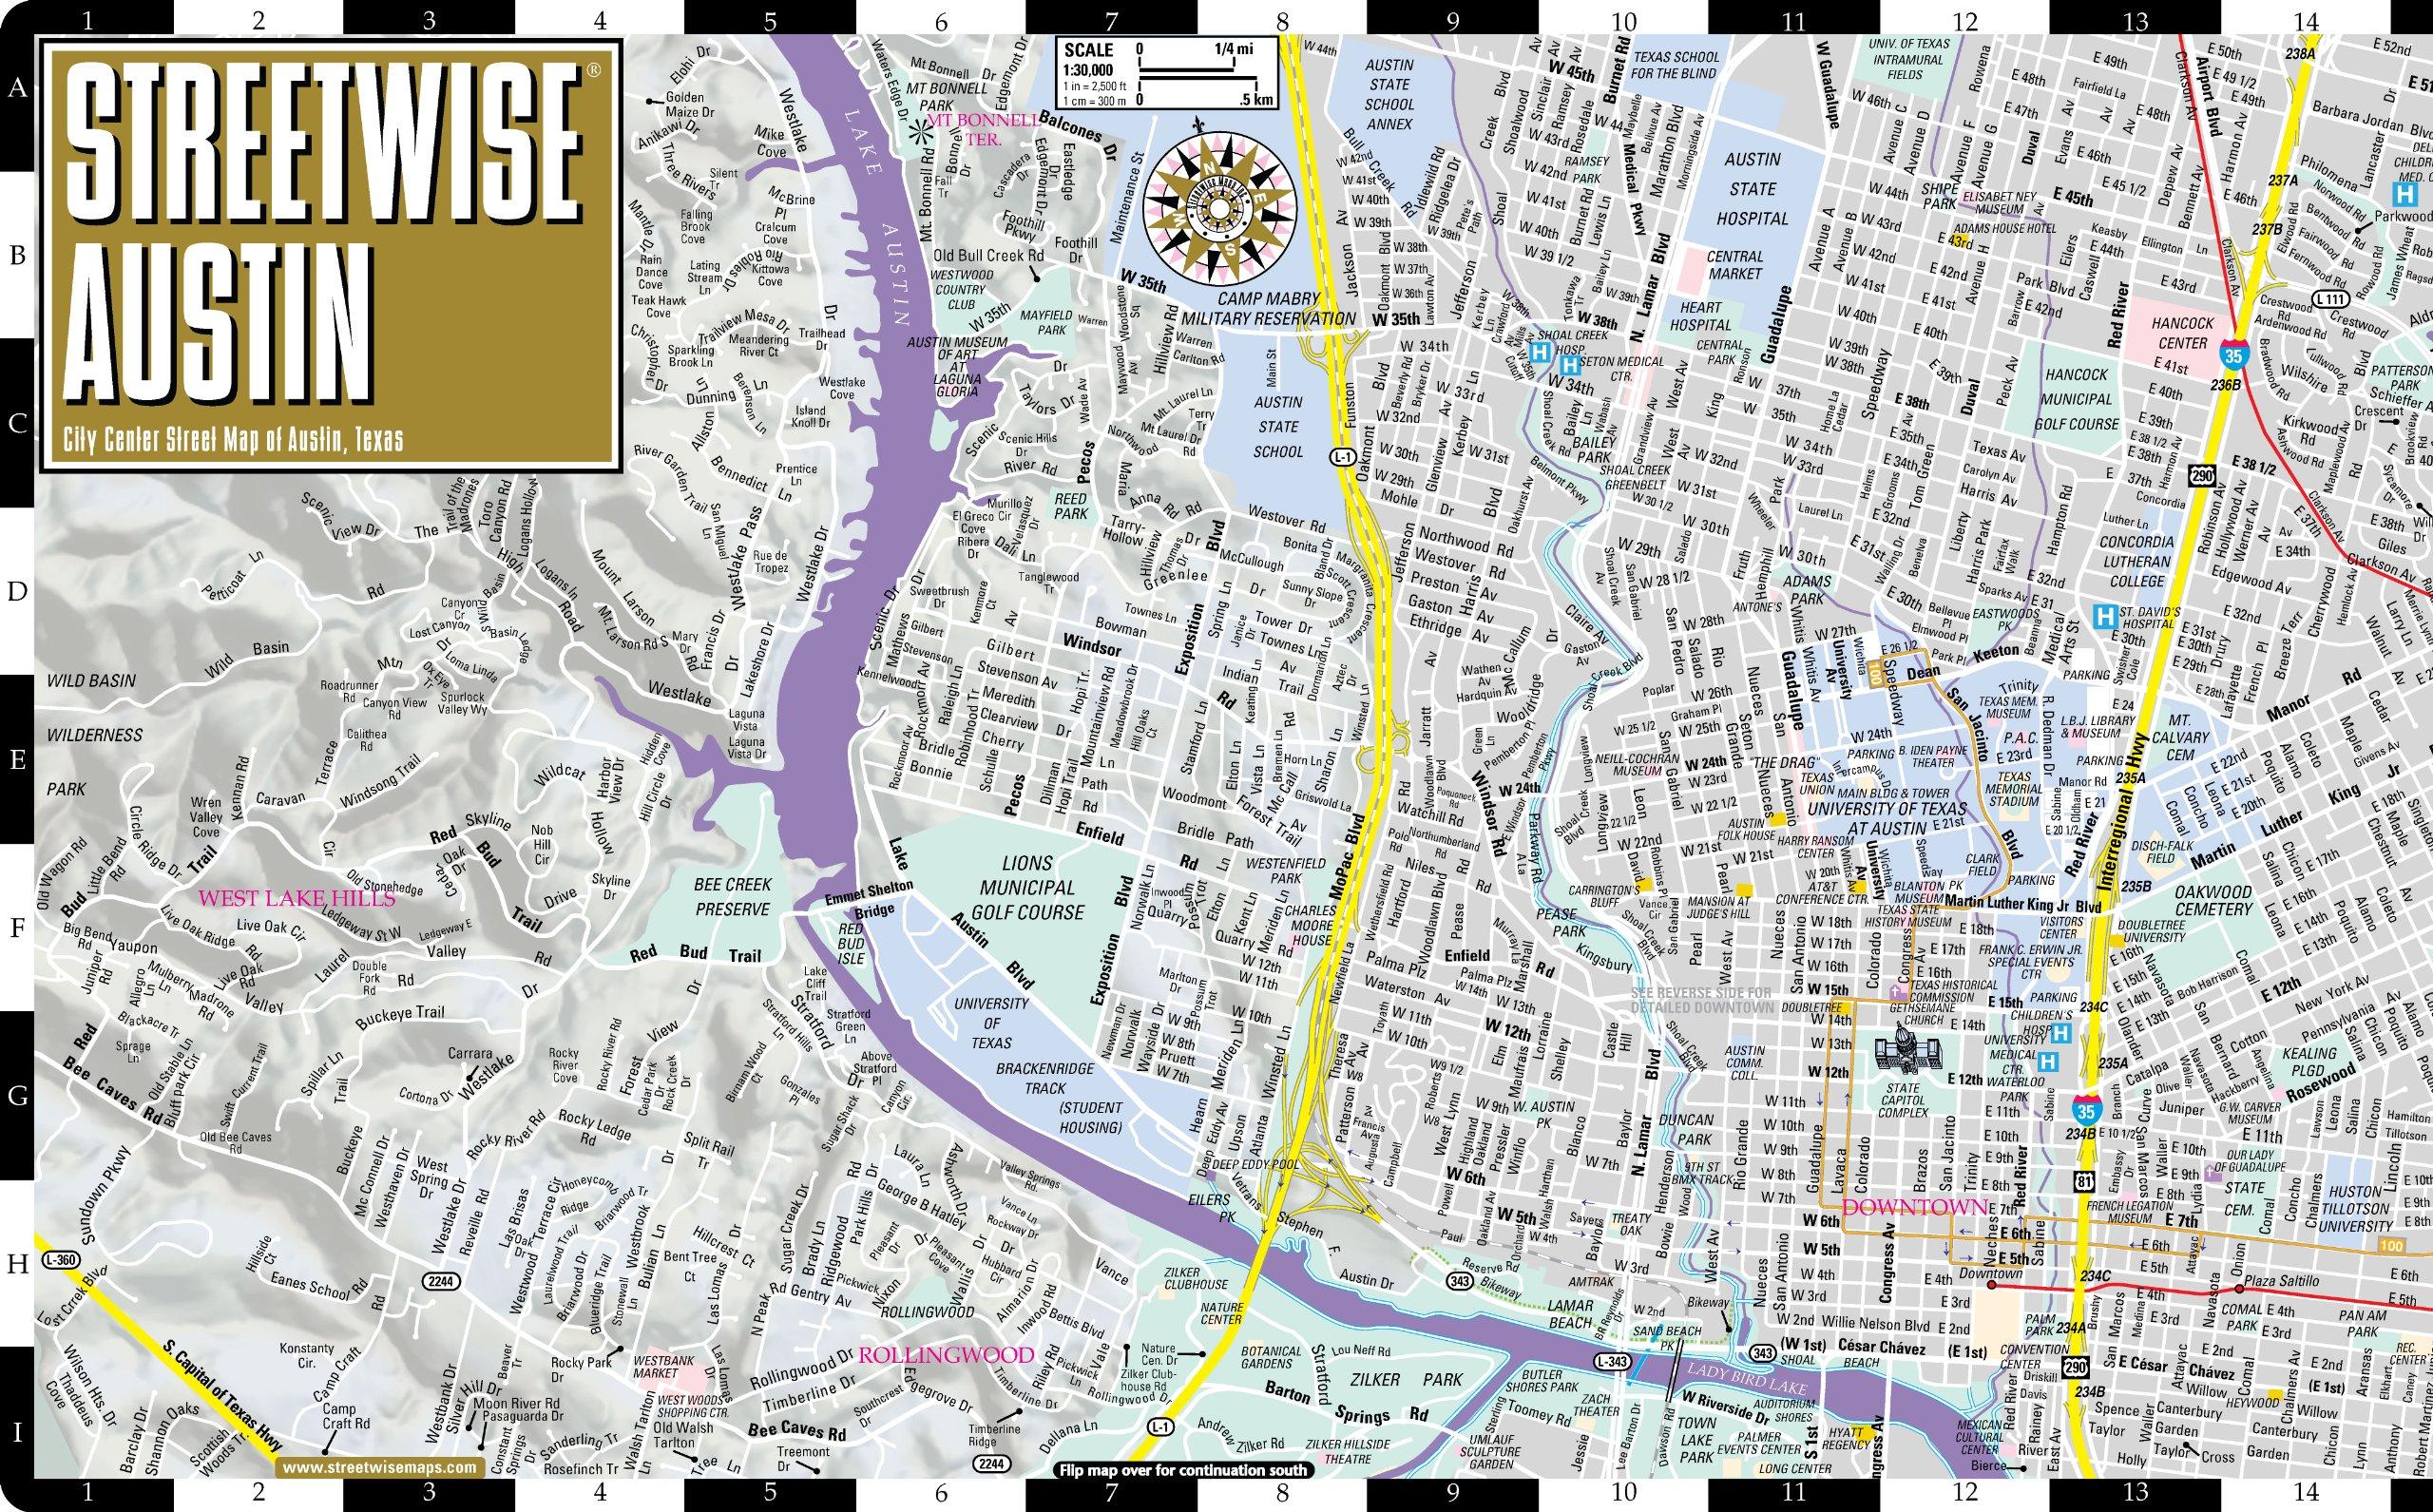 Streetwise Austin Map Laminated City Center Street Map of Austin